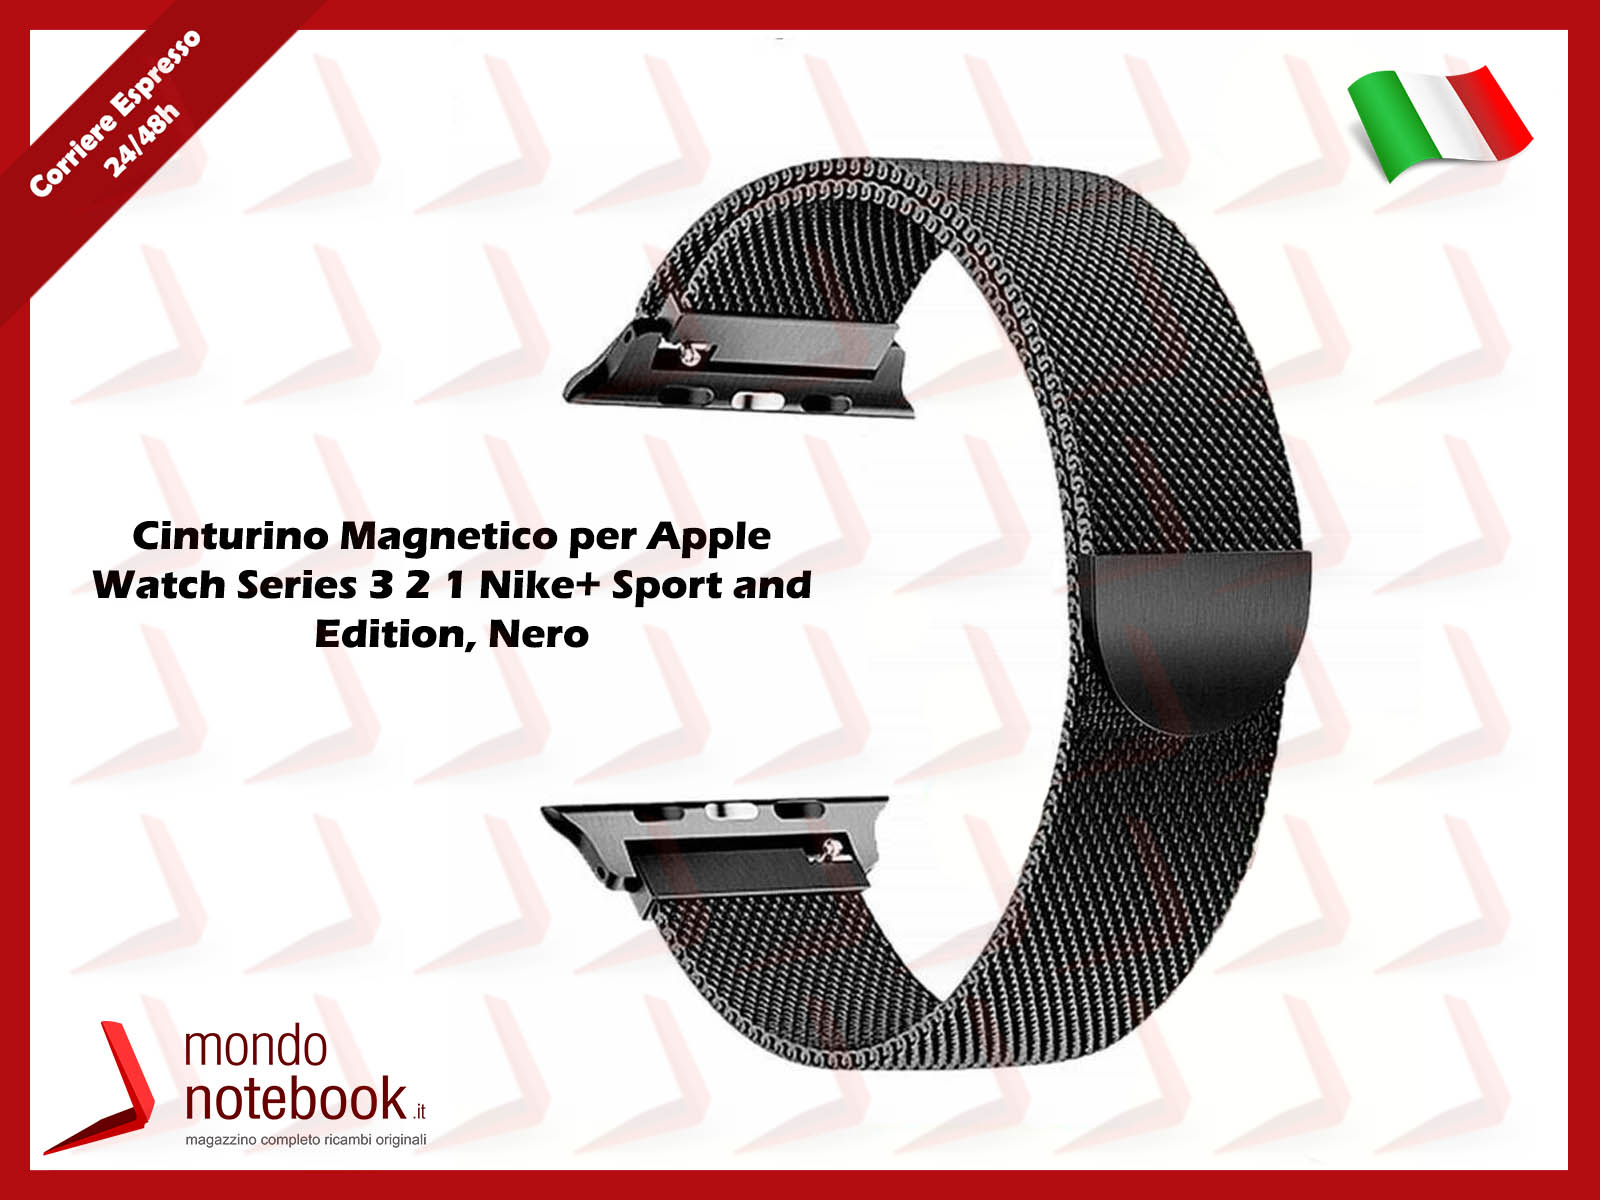 https://www.mondonotebook.it/6647/cinturino-per-apple-watch-series-3-series-2-series-1-sport-edition-m-l-size-black-38-40-mm.jpg